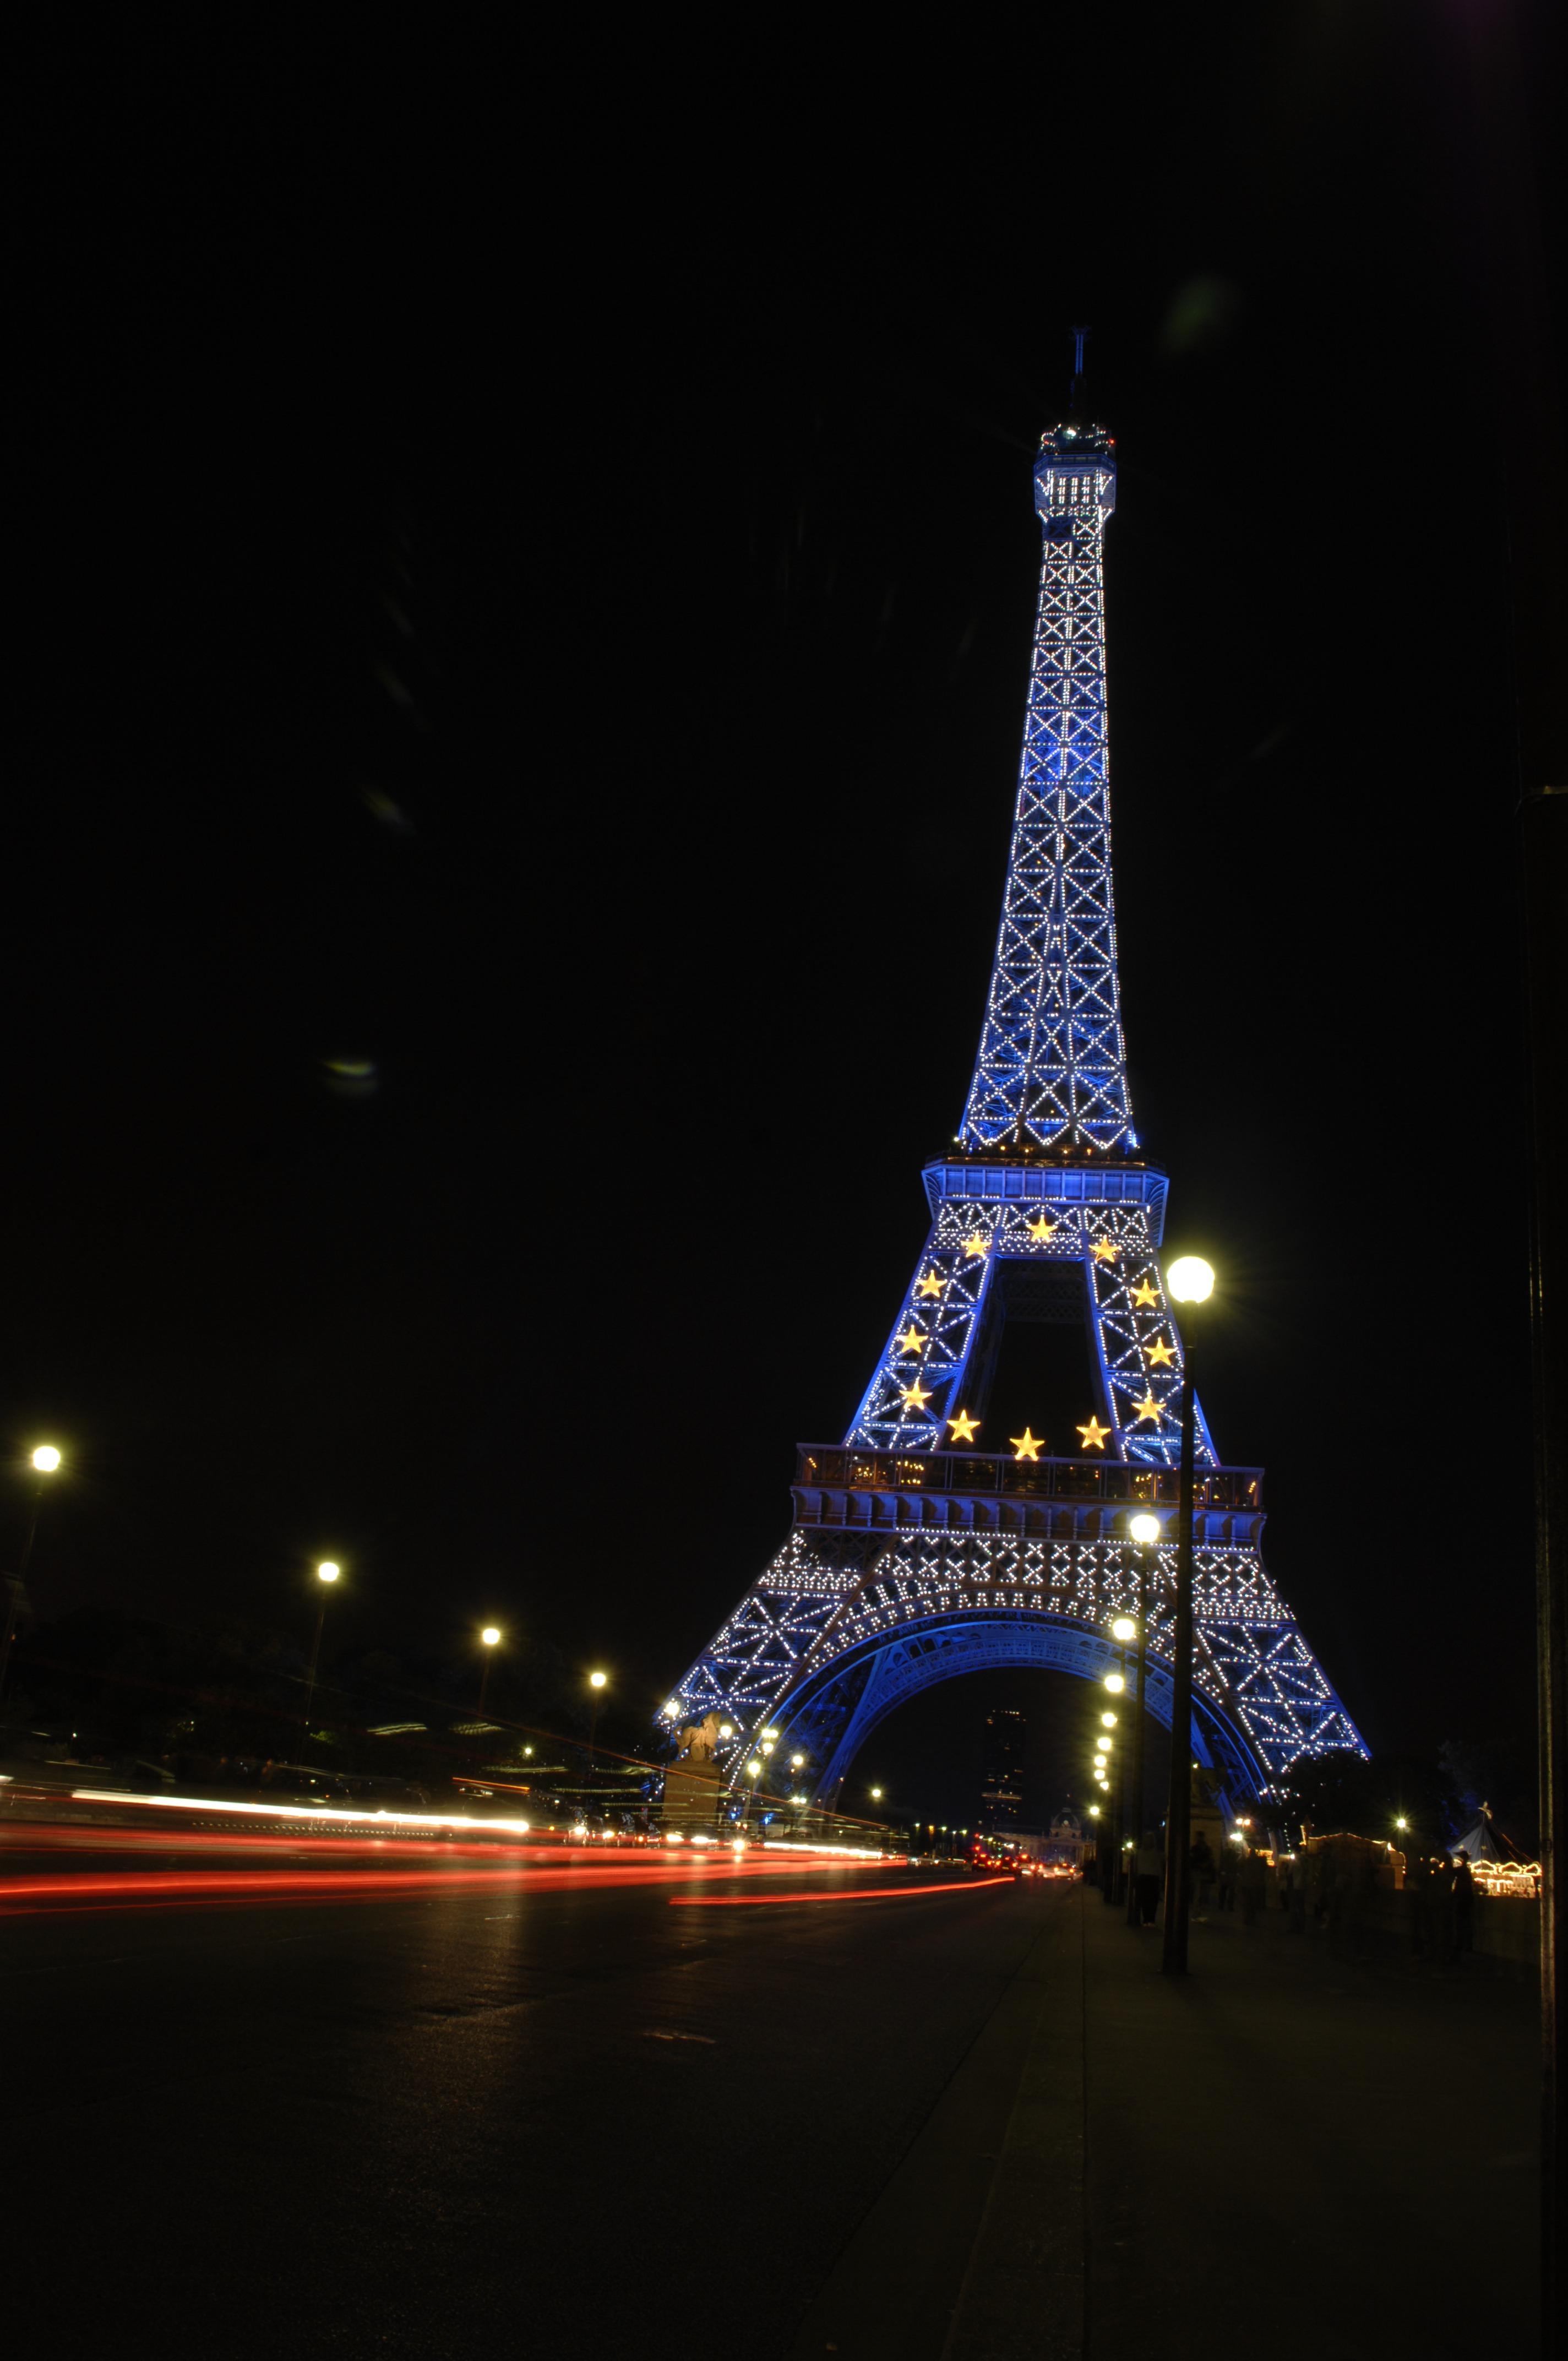 Light Architecture Night Eiffel Tower Paris Evening Landmark Darkness Christmas Lighting Tree Decoration